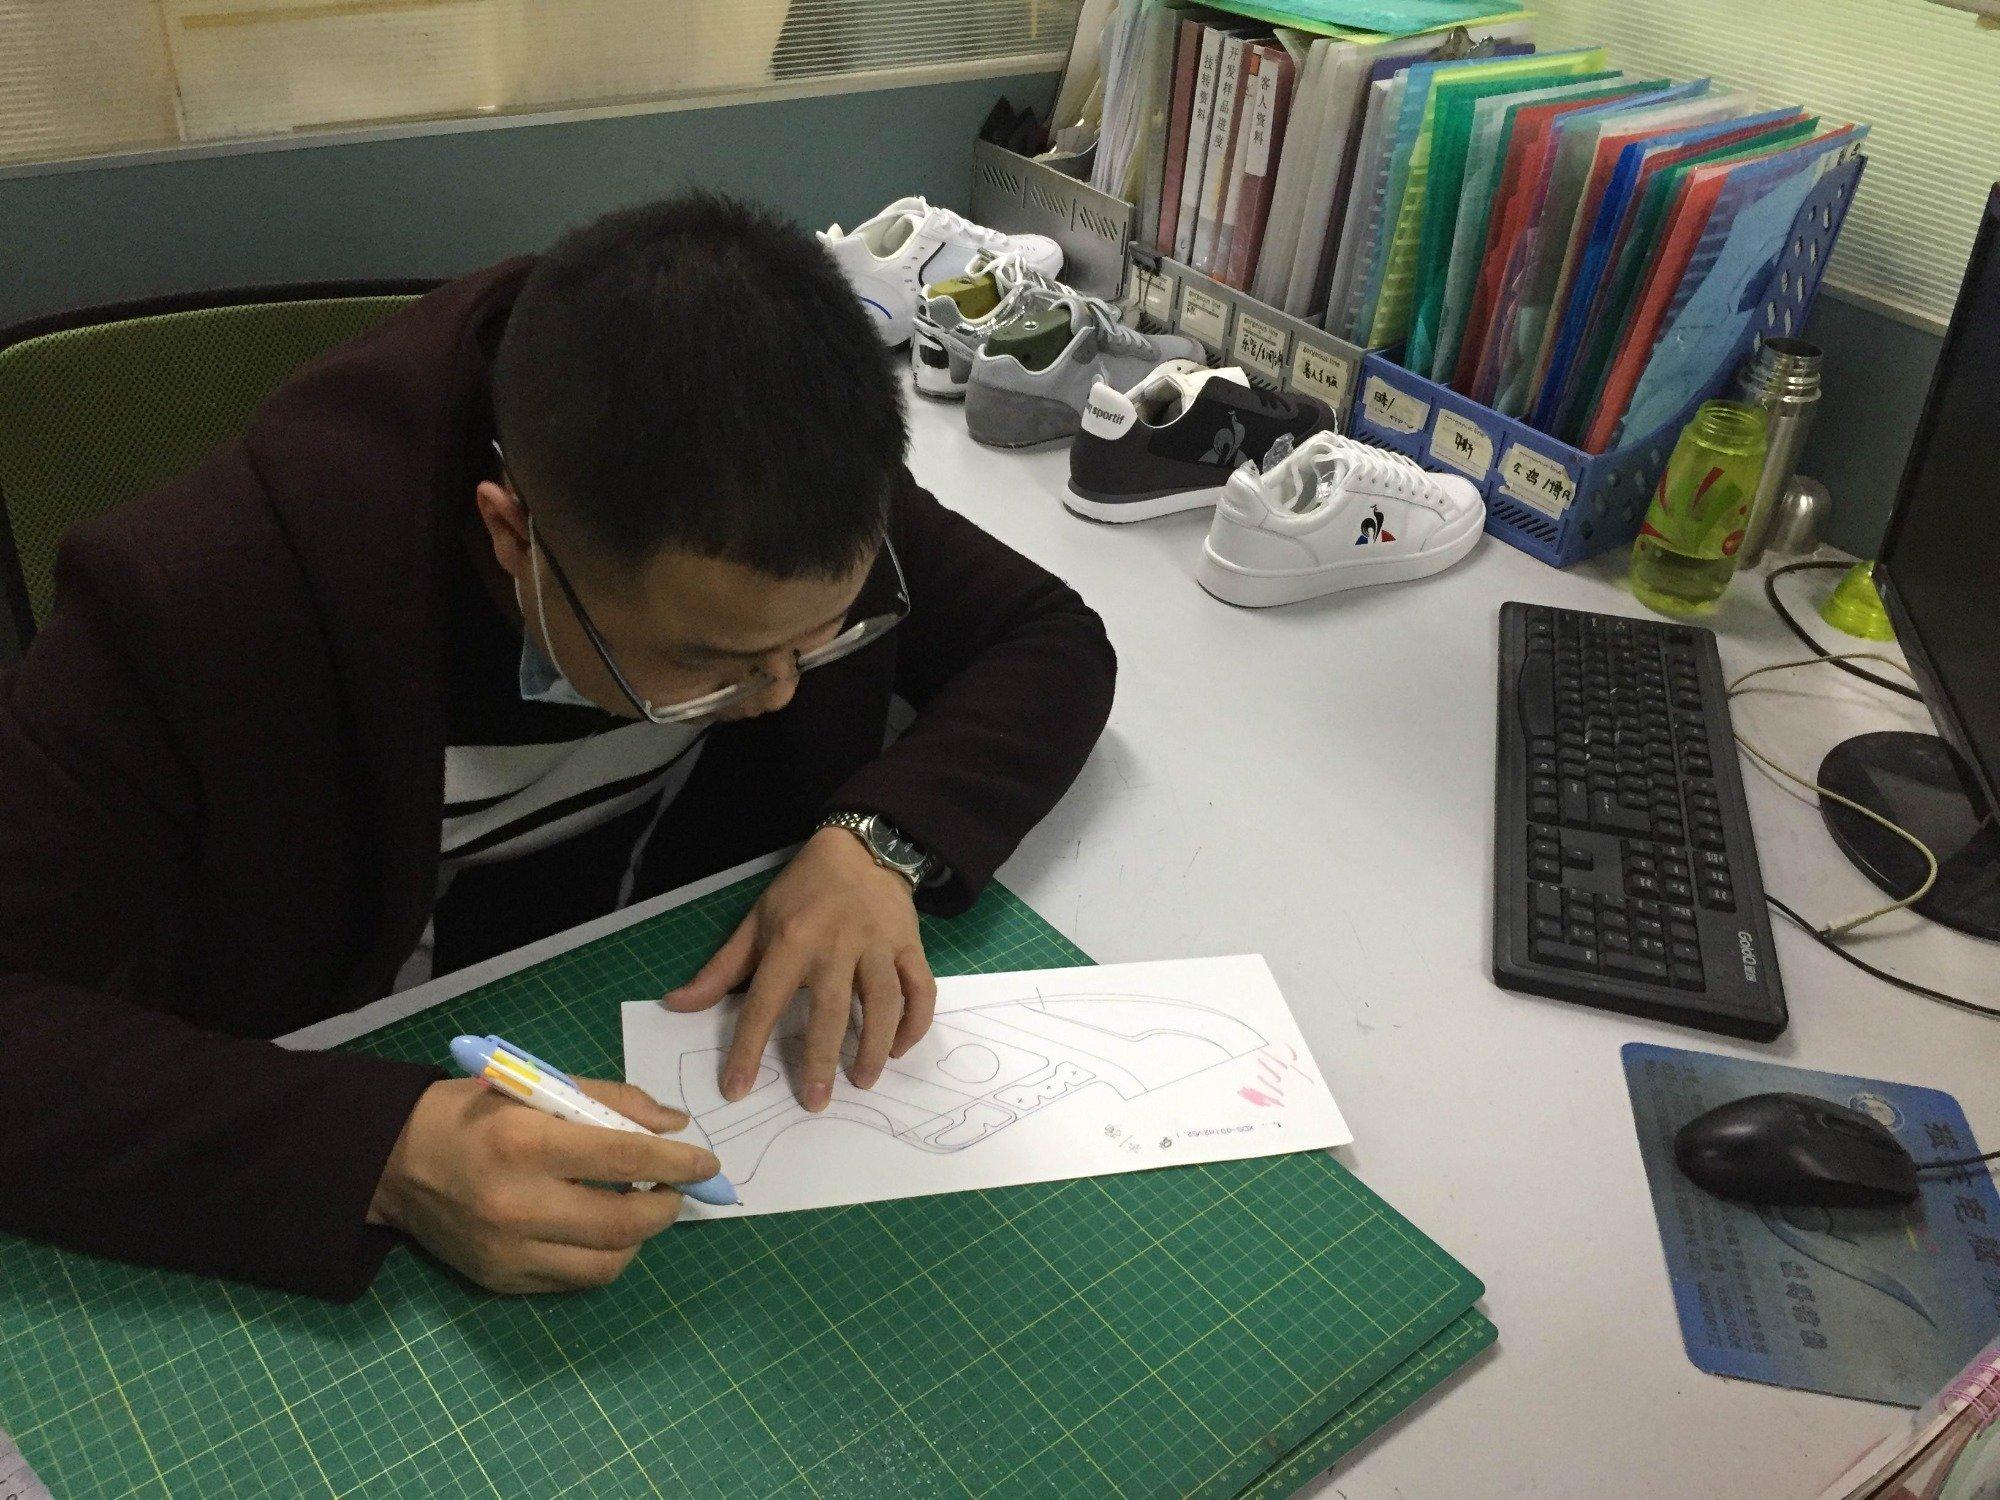 Shoe designer's first draft